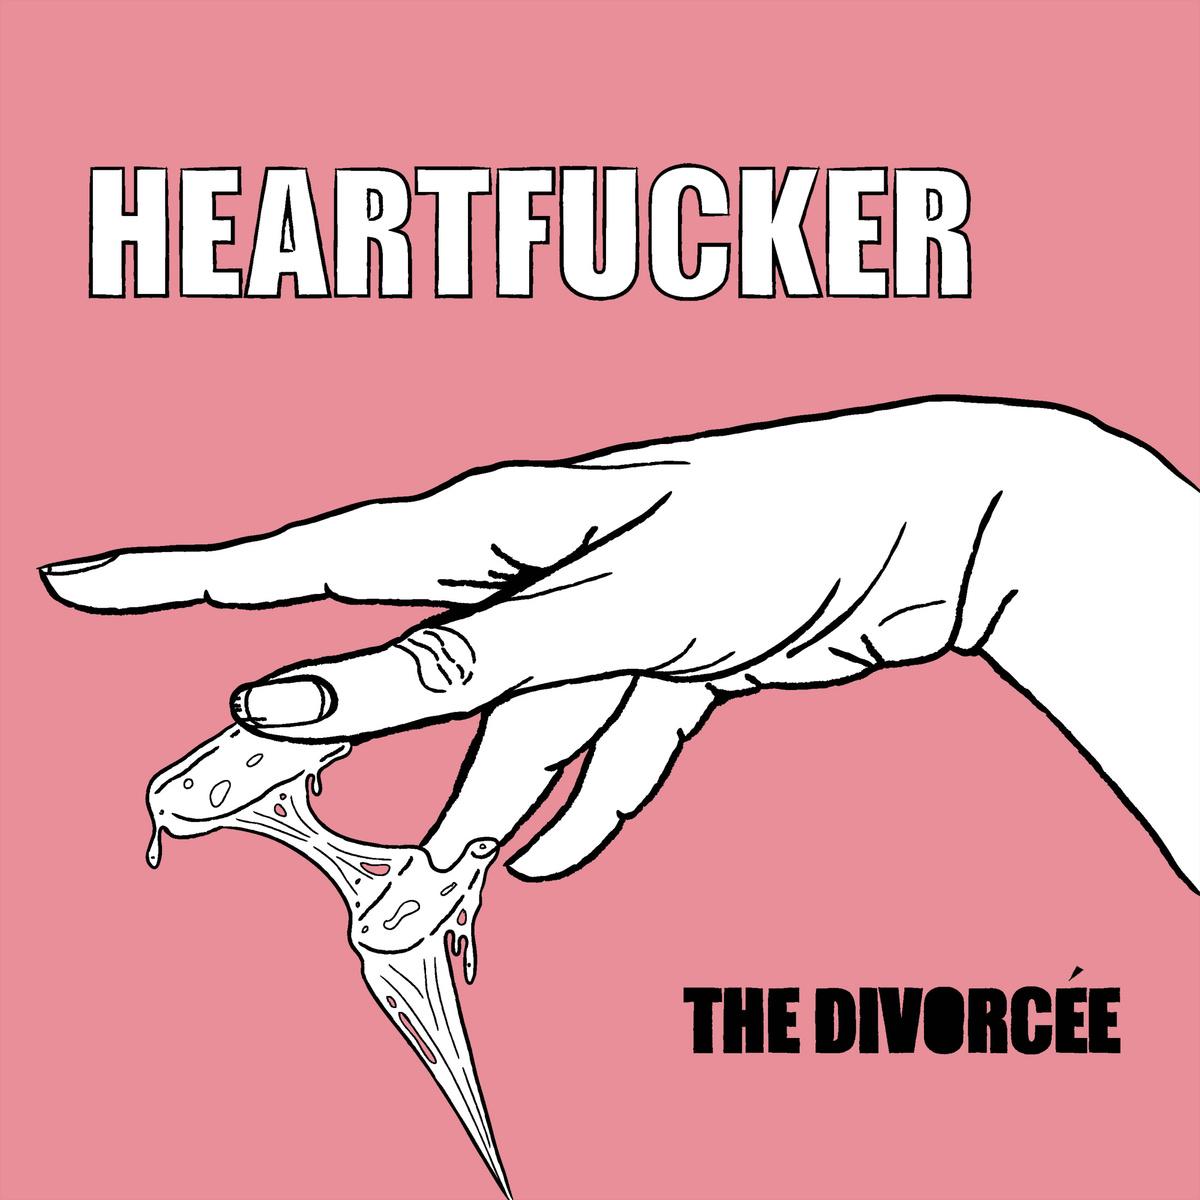 The Divorcee art.jpg